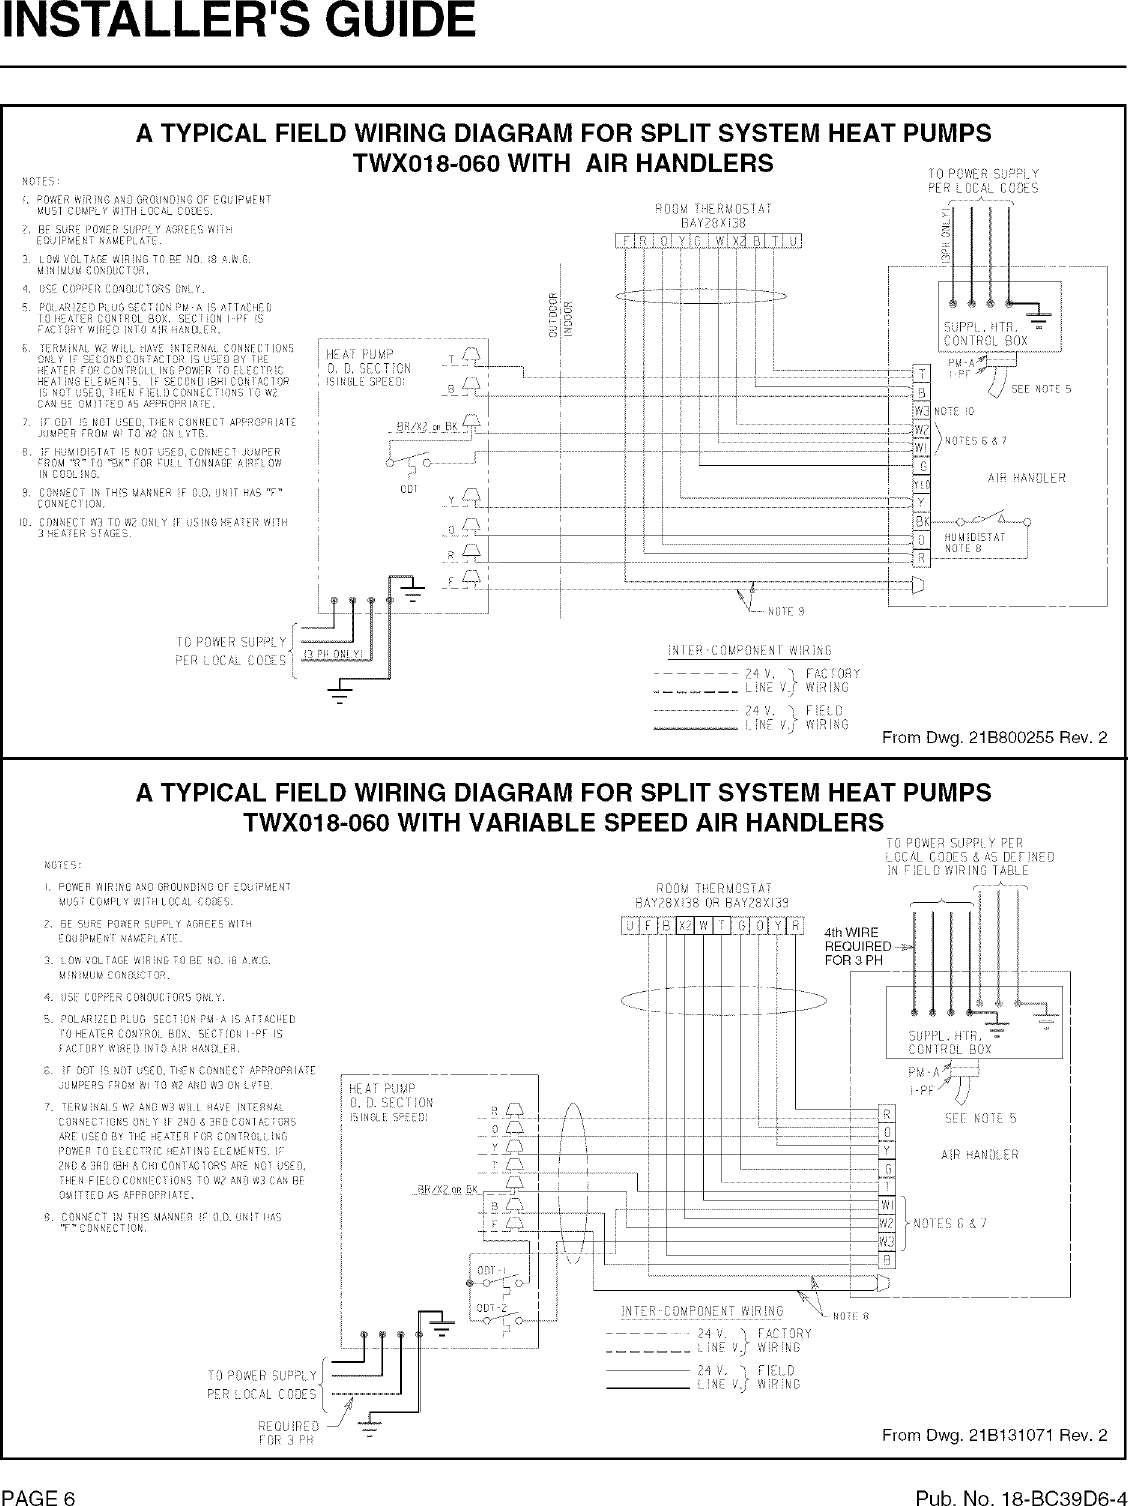 Trane Air Conditioner Heat Pumpoutside Unit Manual L0802054 Split System Pump Wiring Diagram Page 6 Of 8